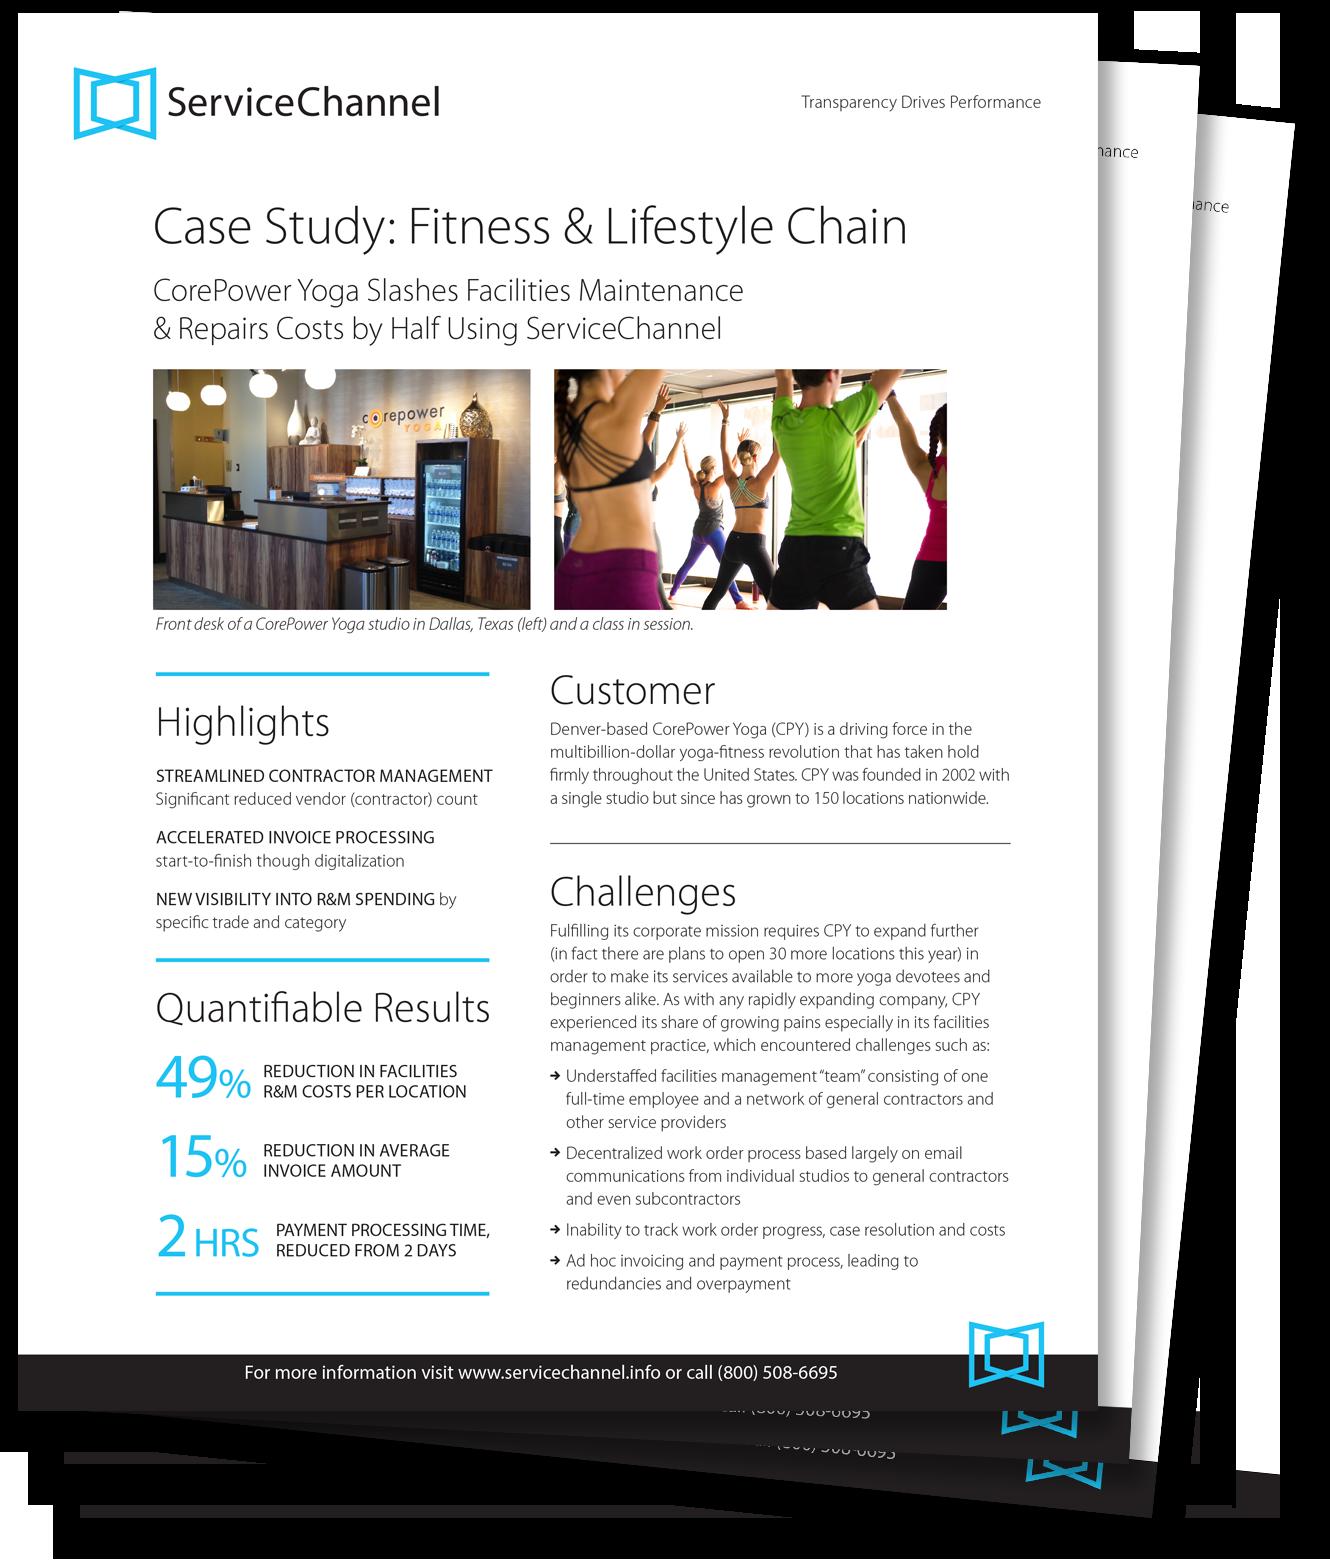 CorePower_Yoga_-_Fitness__Lifestyle_Facilities_Management_Case_Study_CTA.png